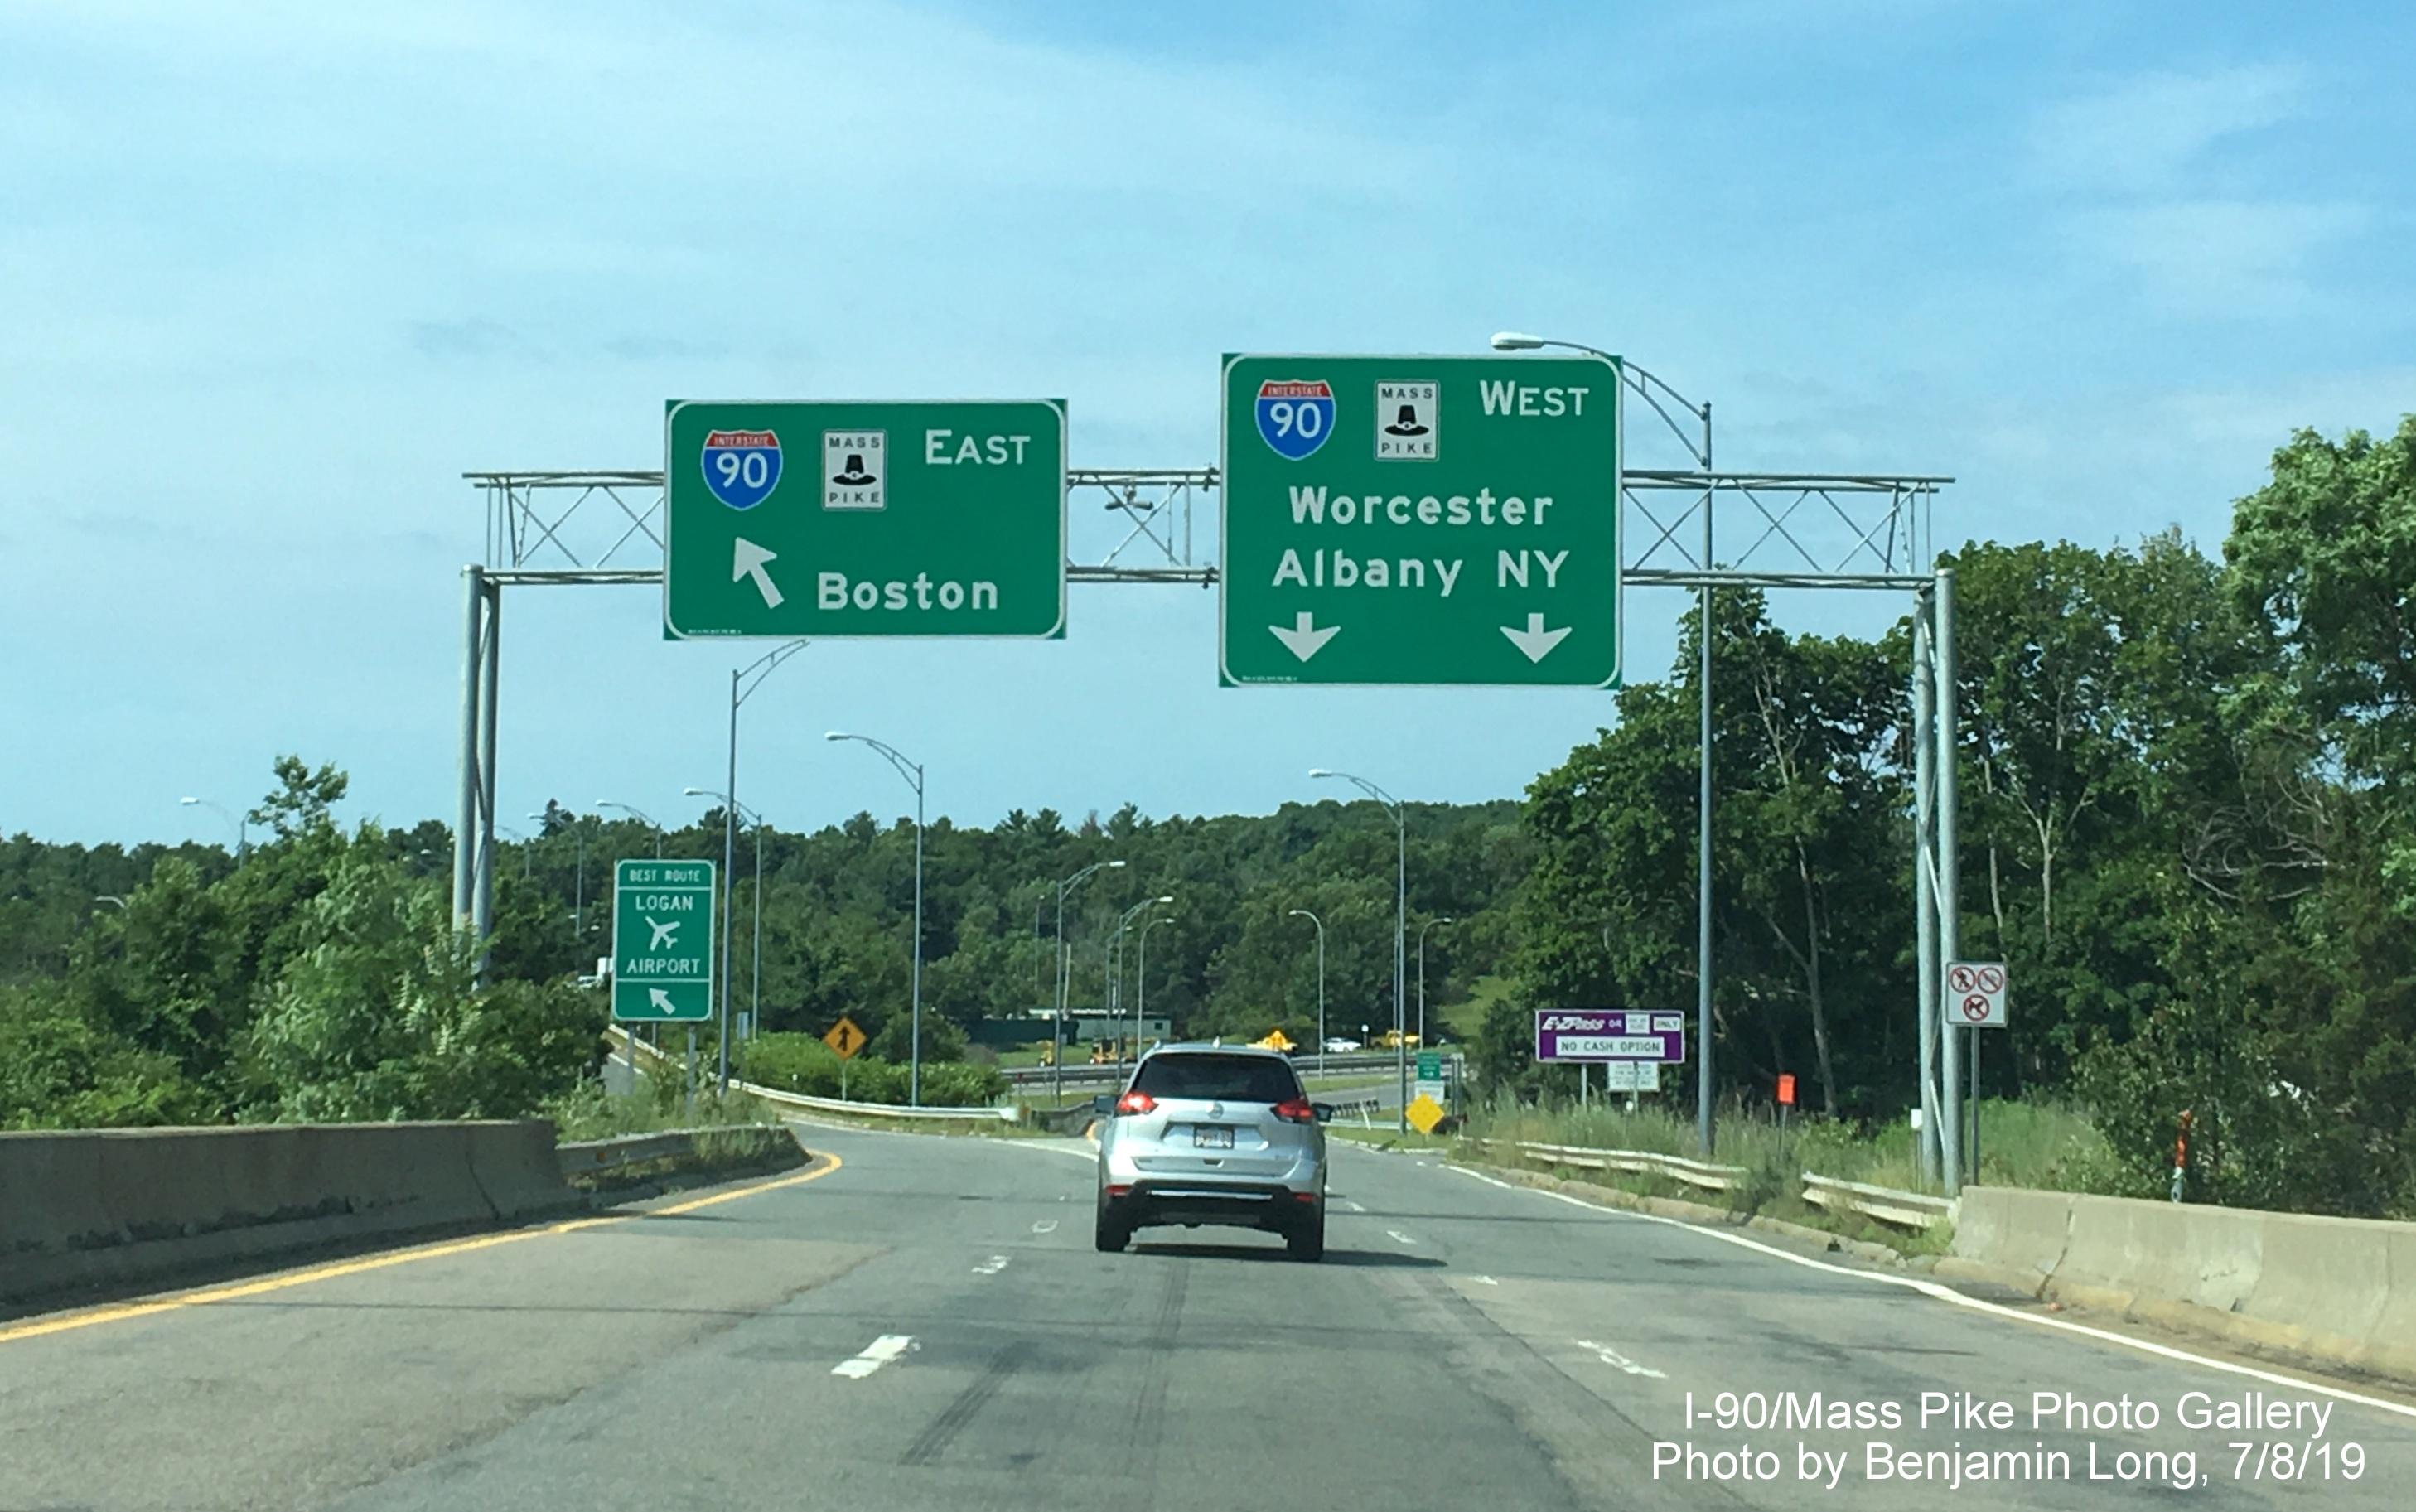 I-90/Mass Pike Photo Gallery